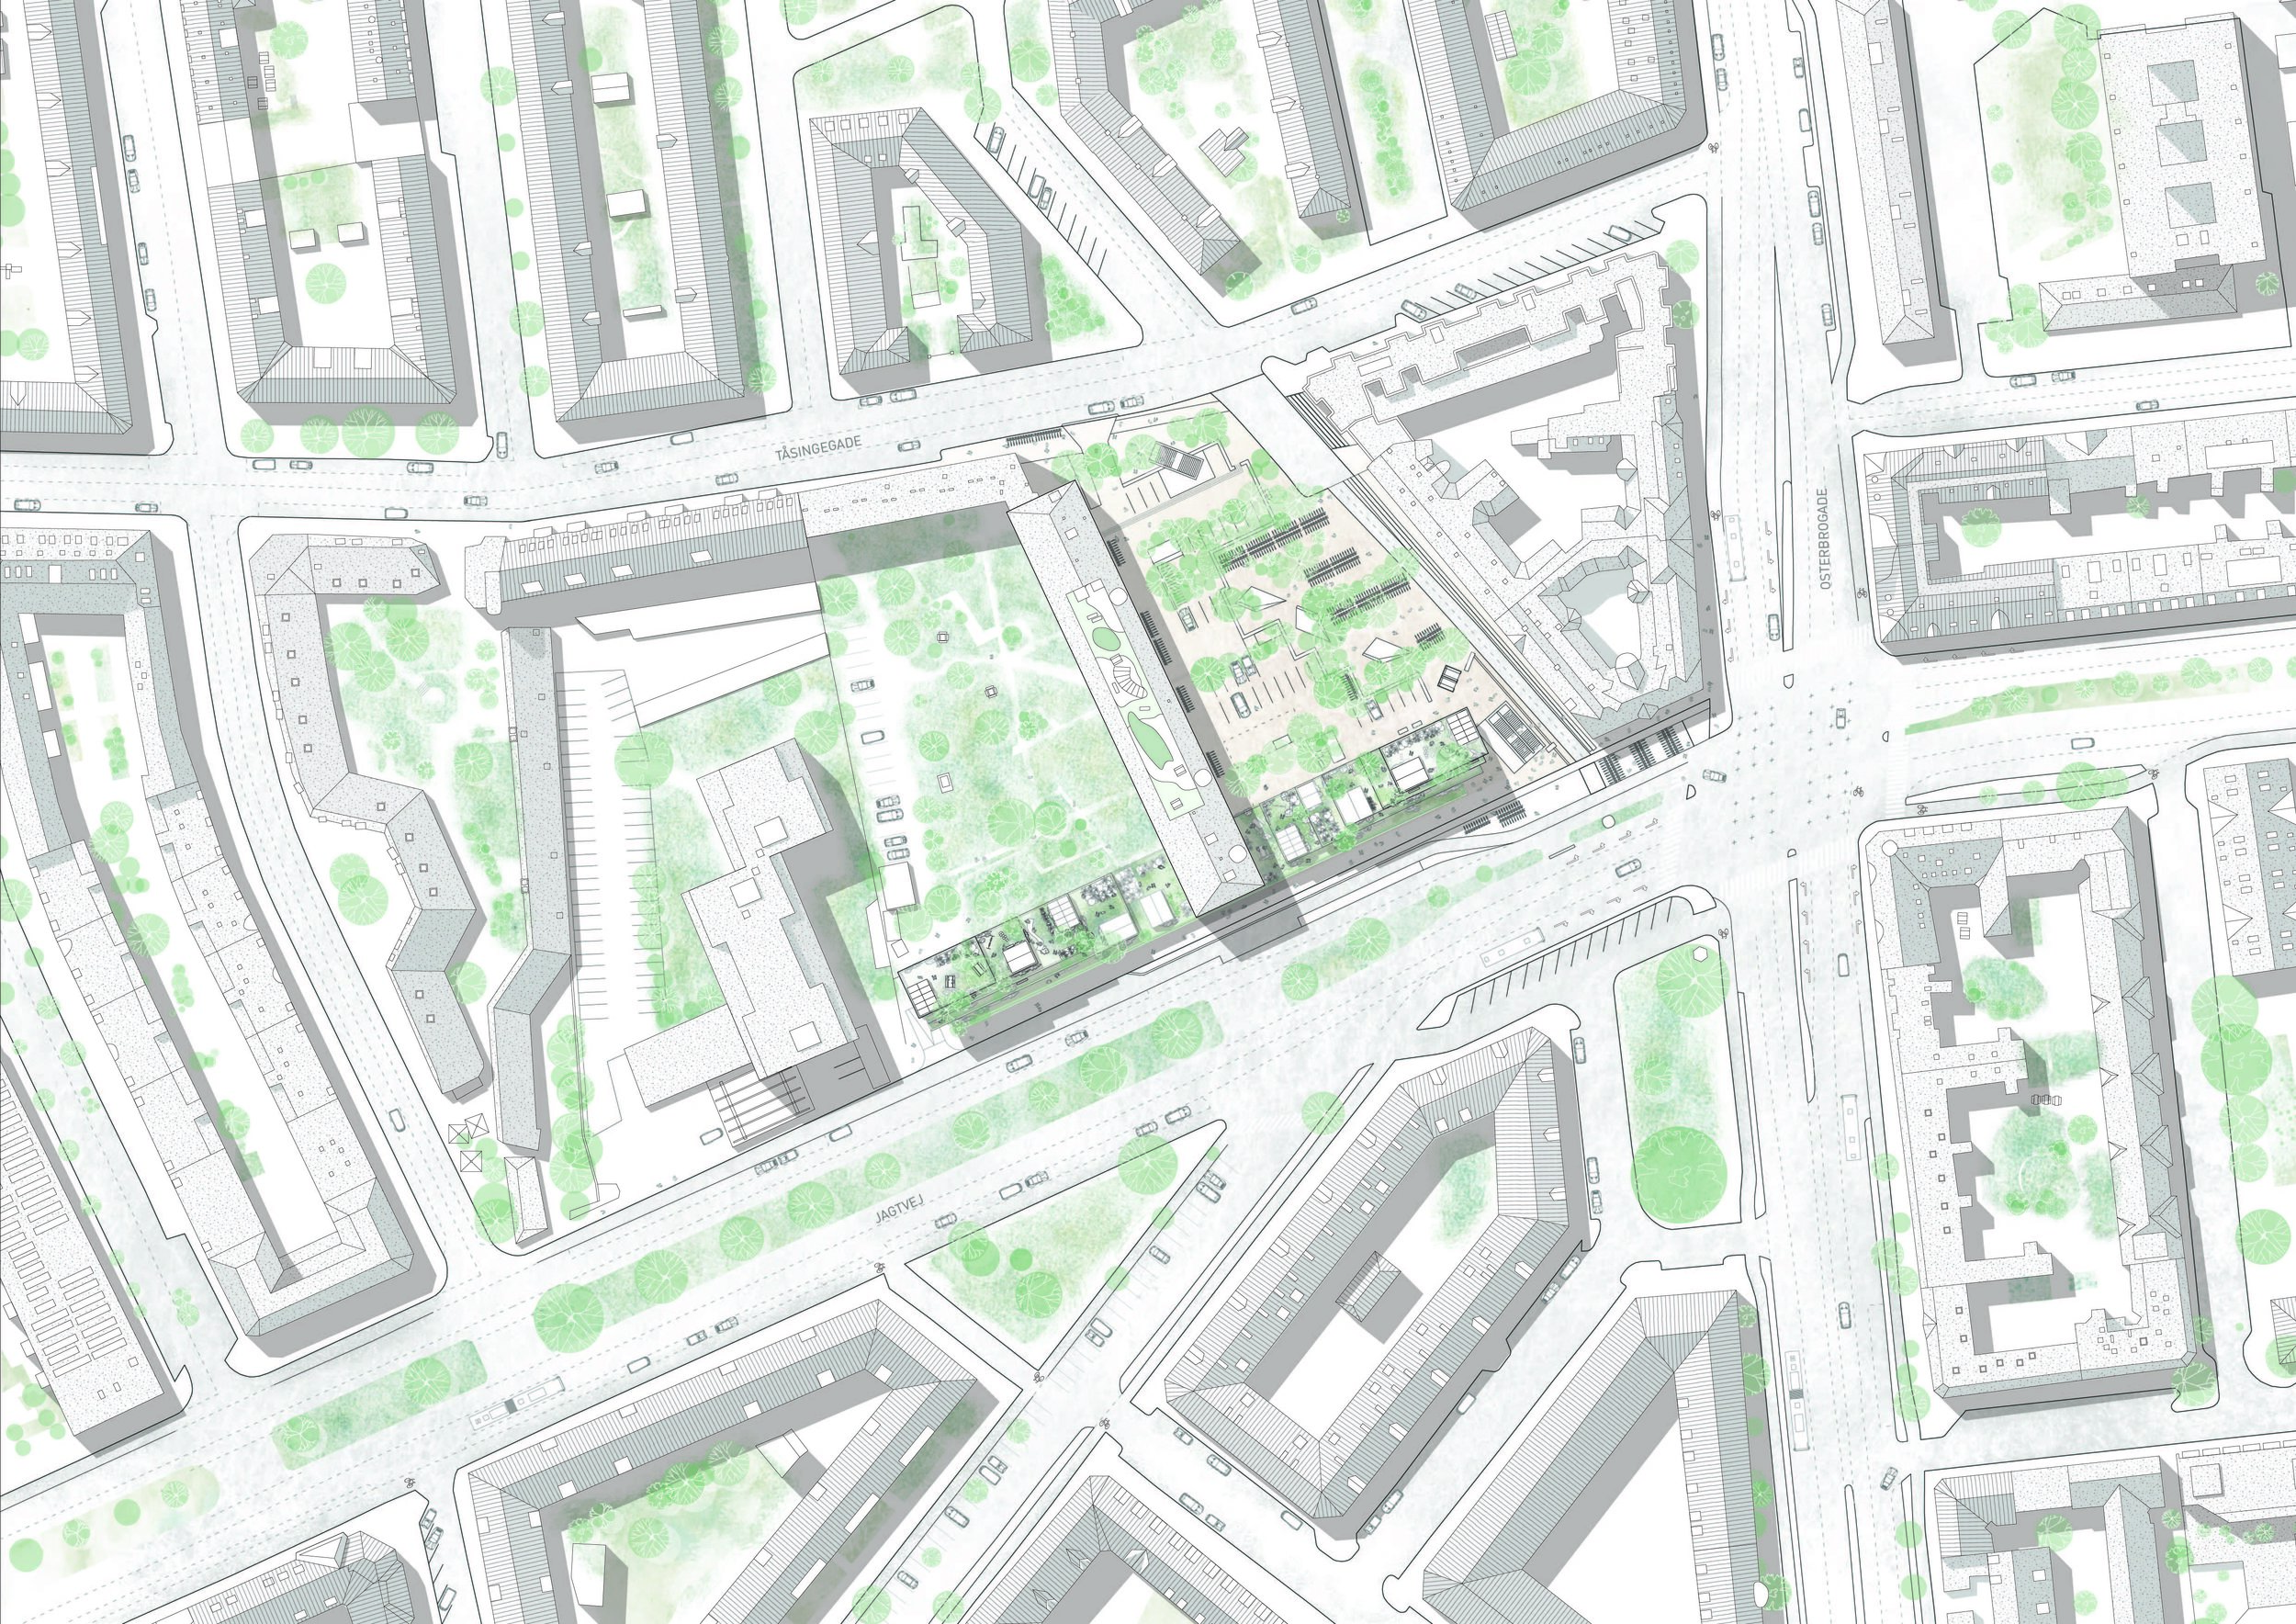 2019_03_26_Siteplan-01.jpg